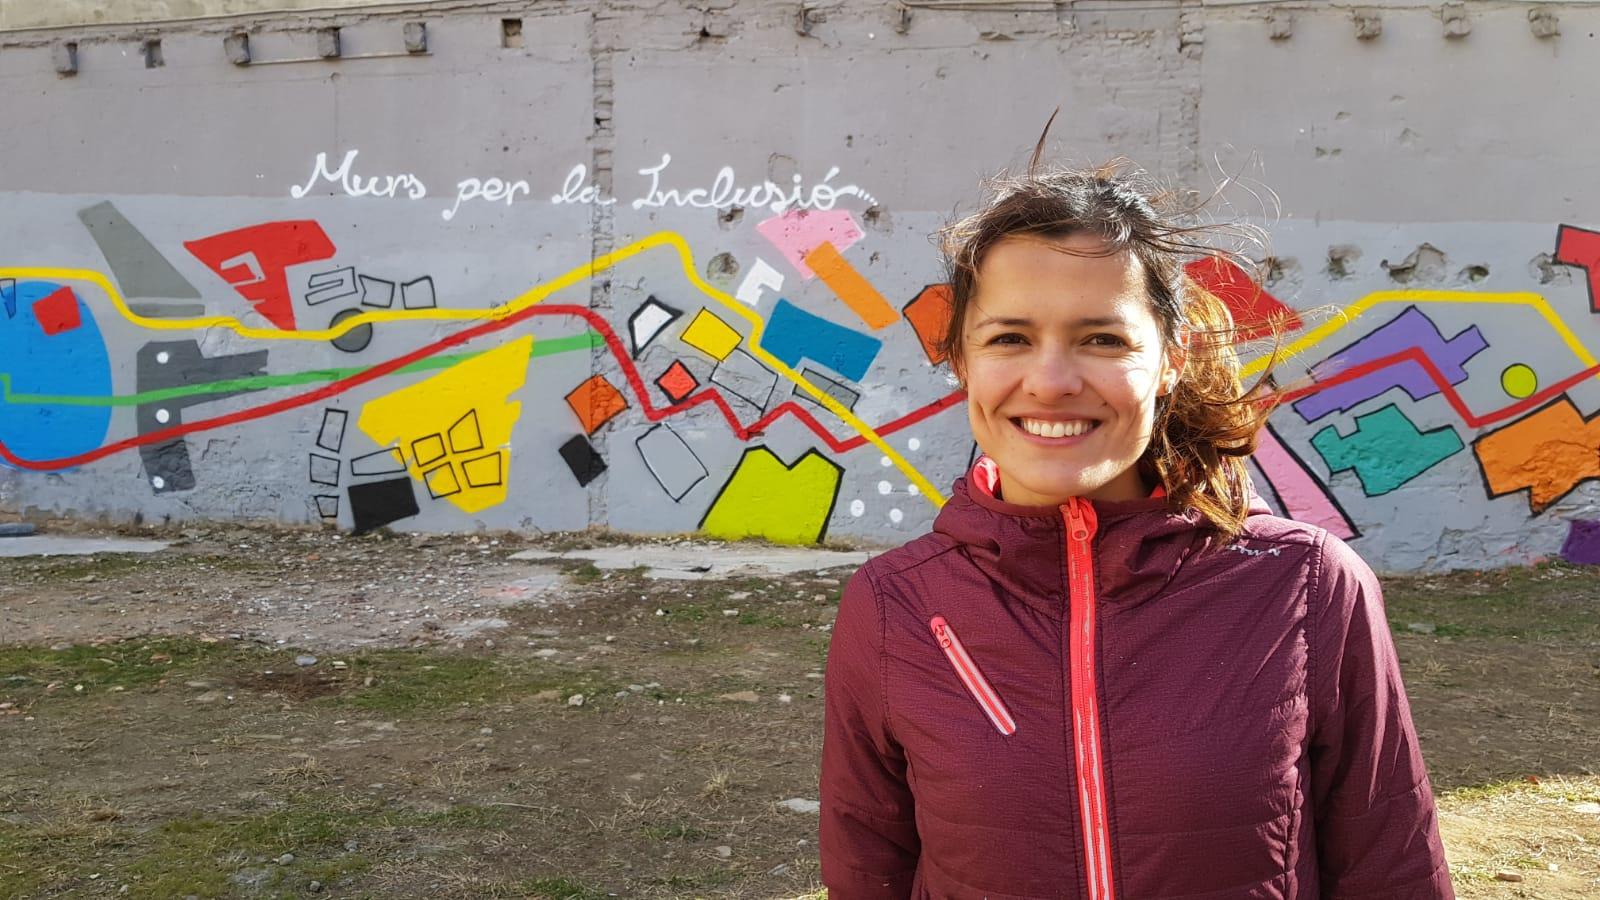 mural-y-retrato-plaza-carmen-